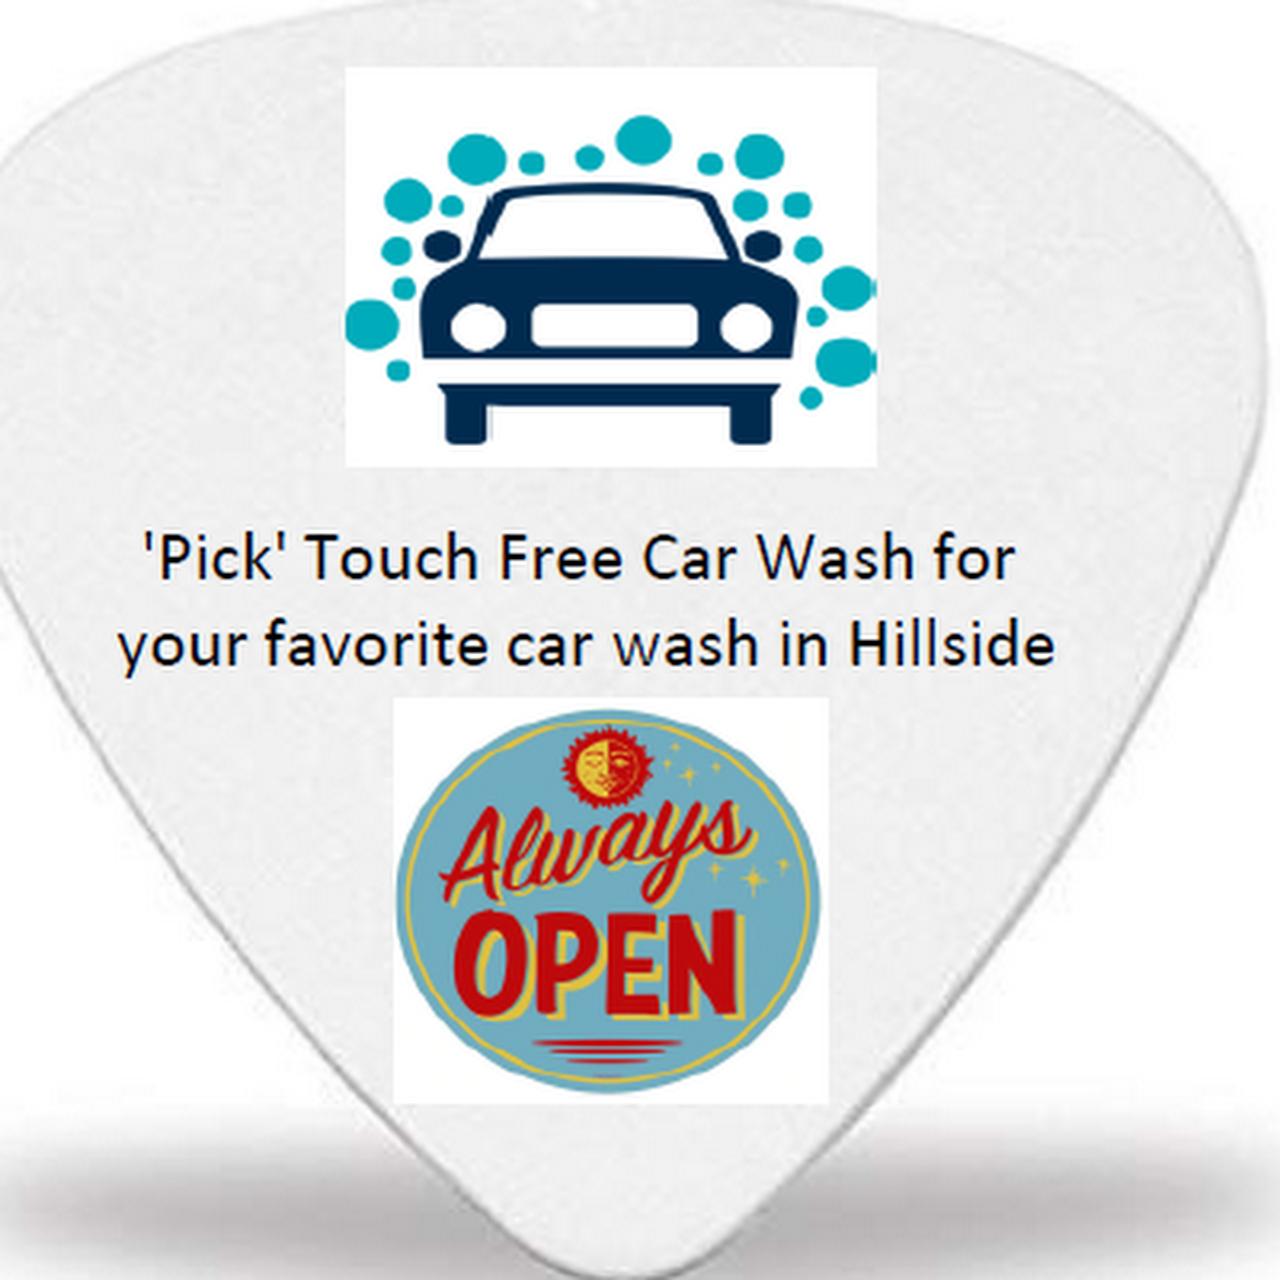 Touch Free Car Wash - Self Service Car Wash in Hillside Illinois